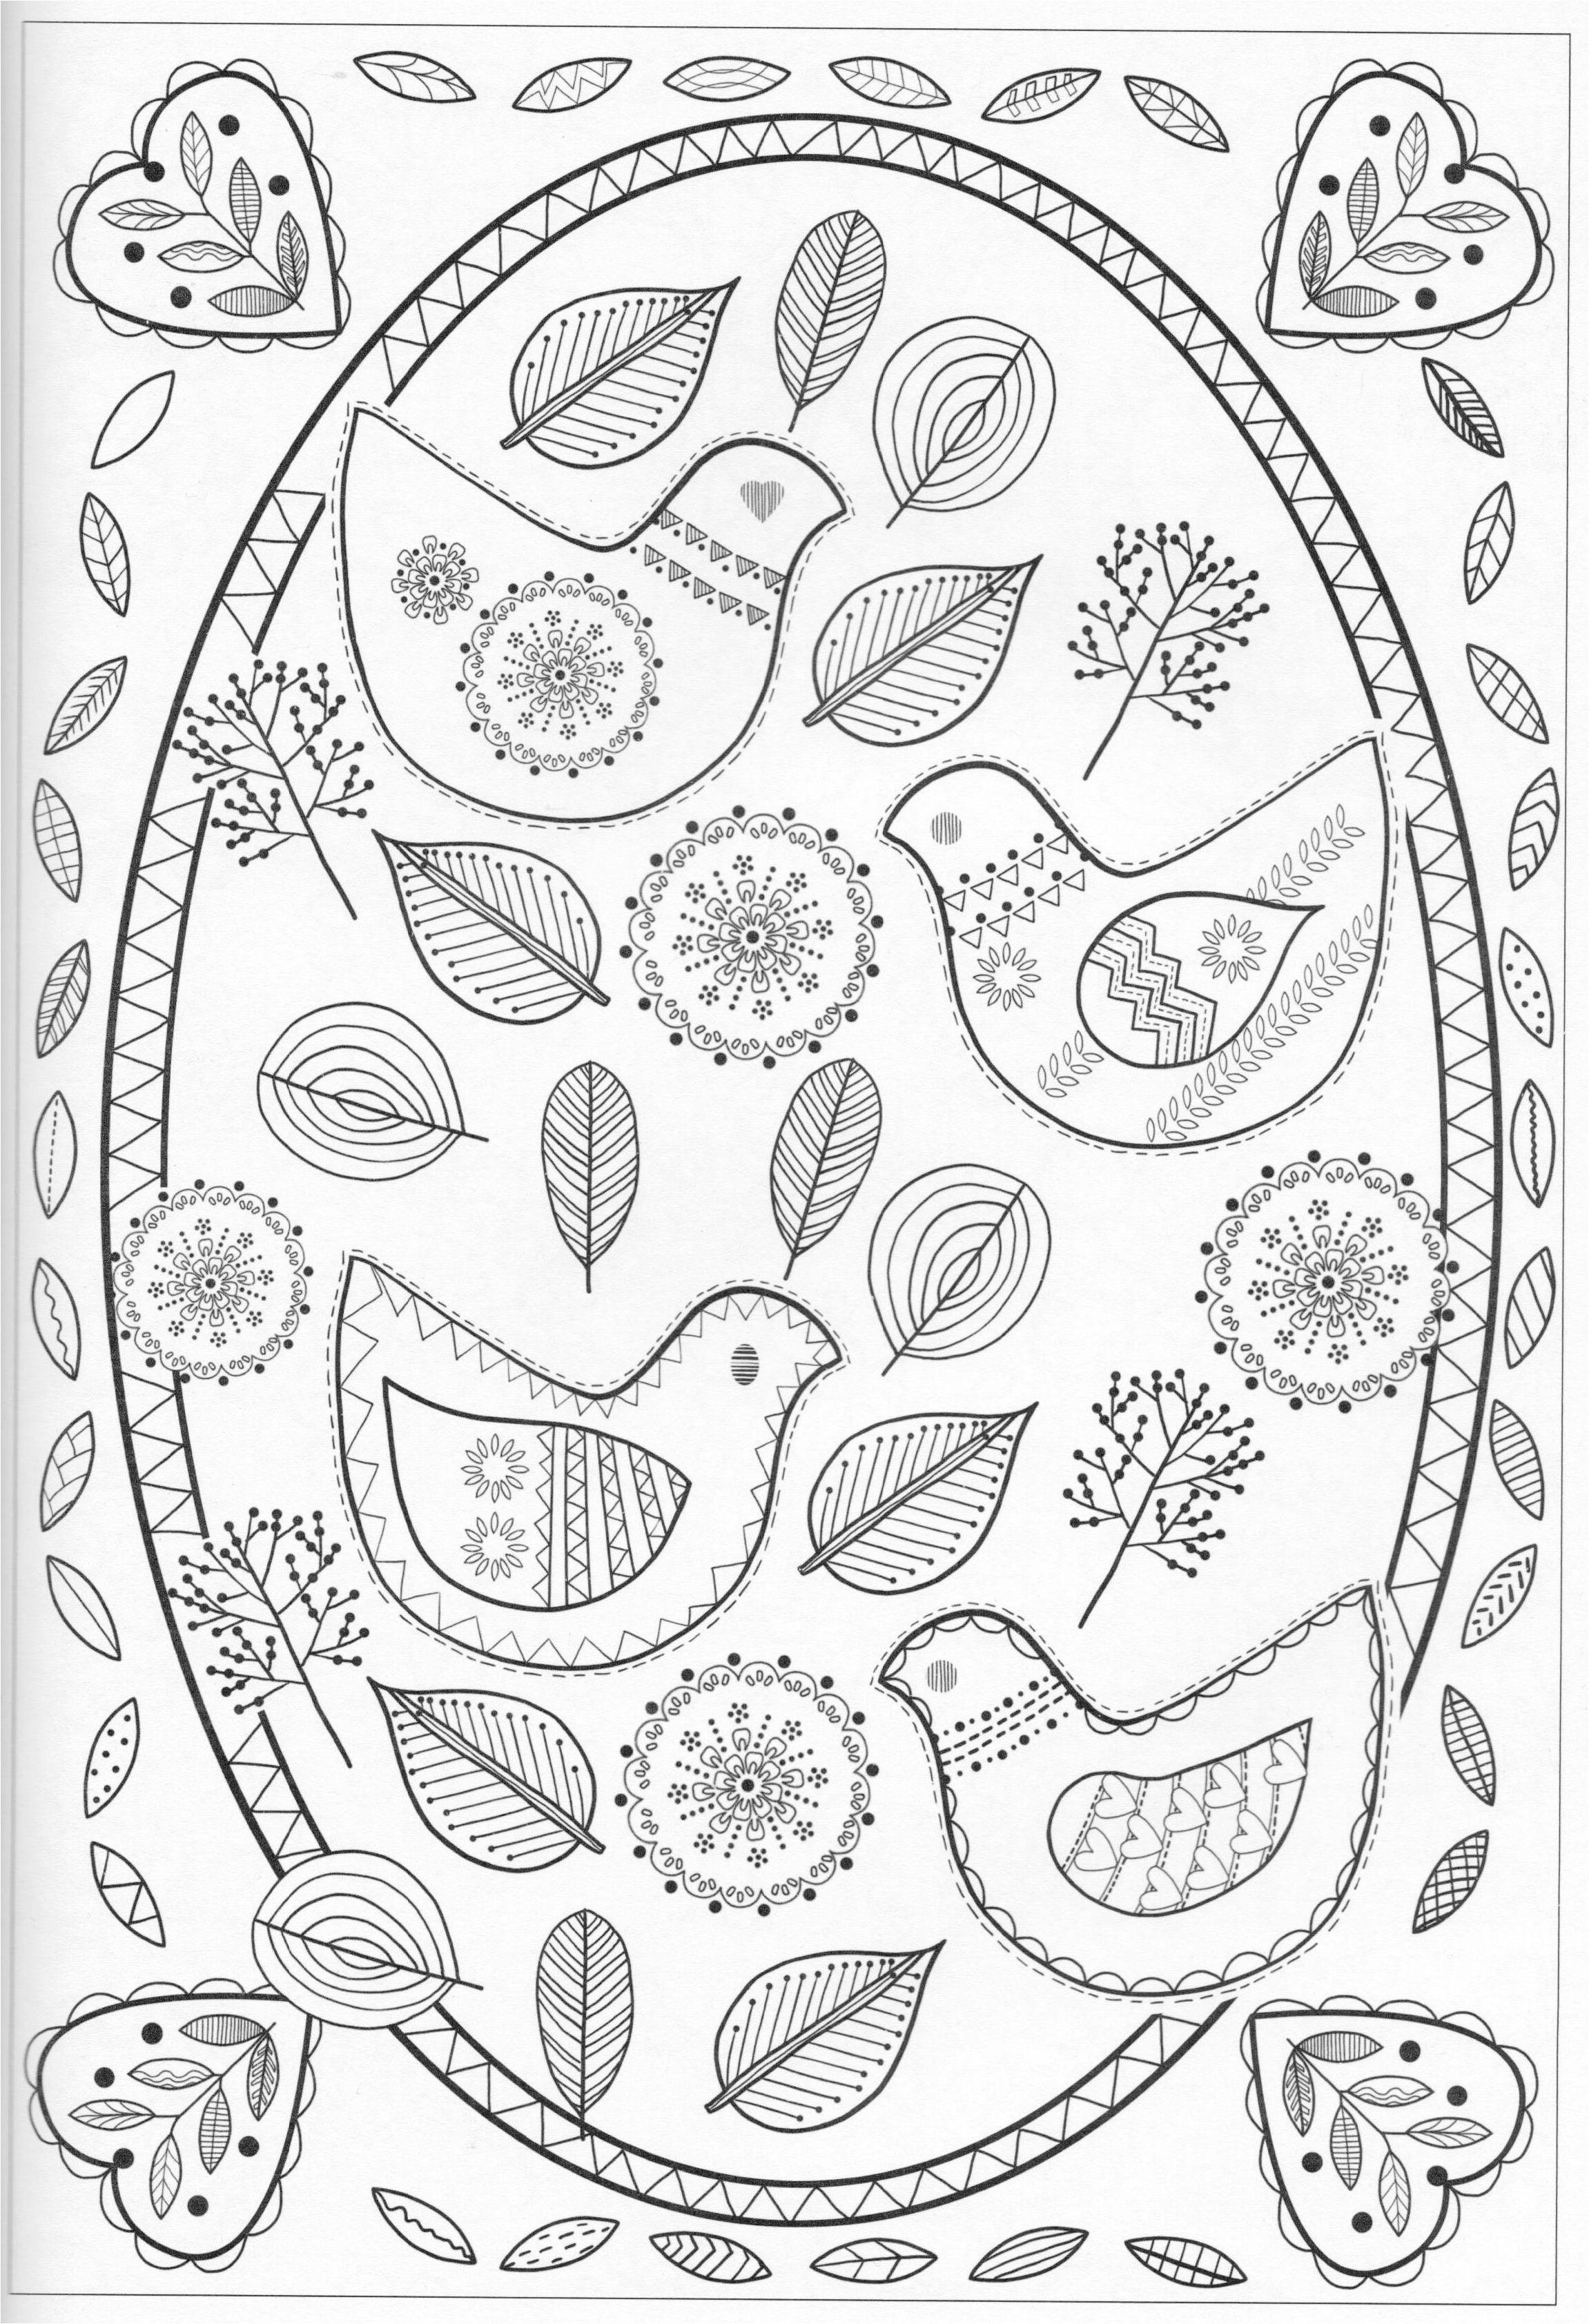 Ausmalbilder Bvb 09 Einzigartig Mandala Zum Ausdrucken Rosen Stock